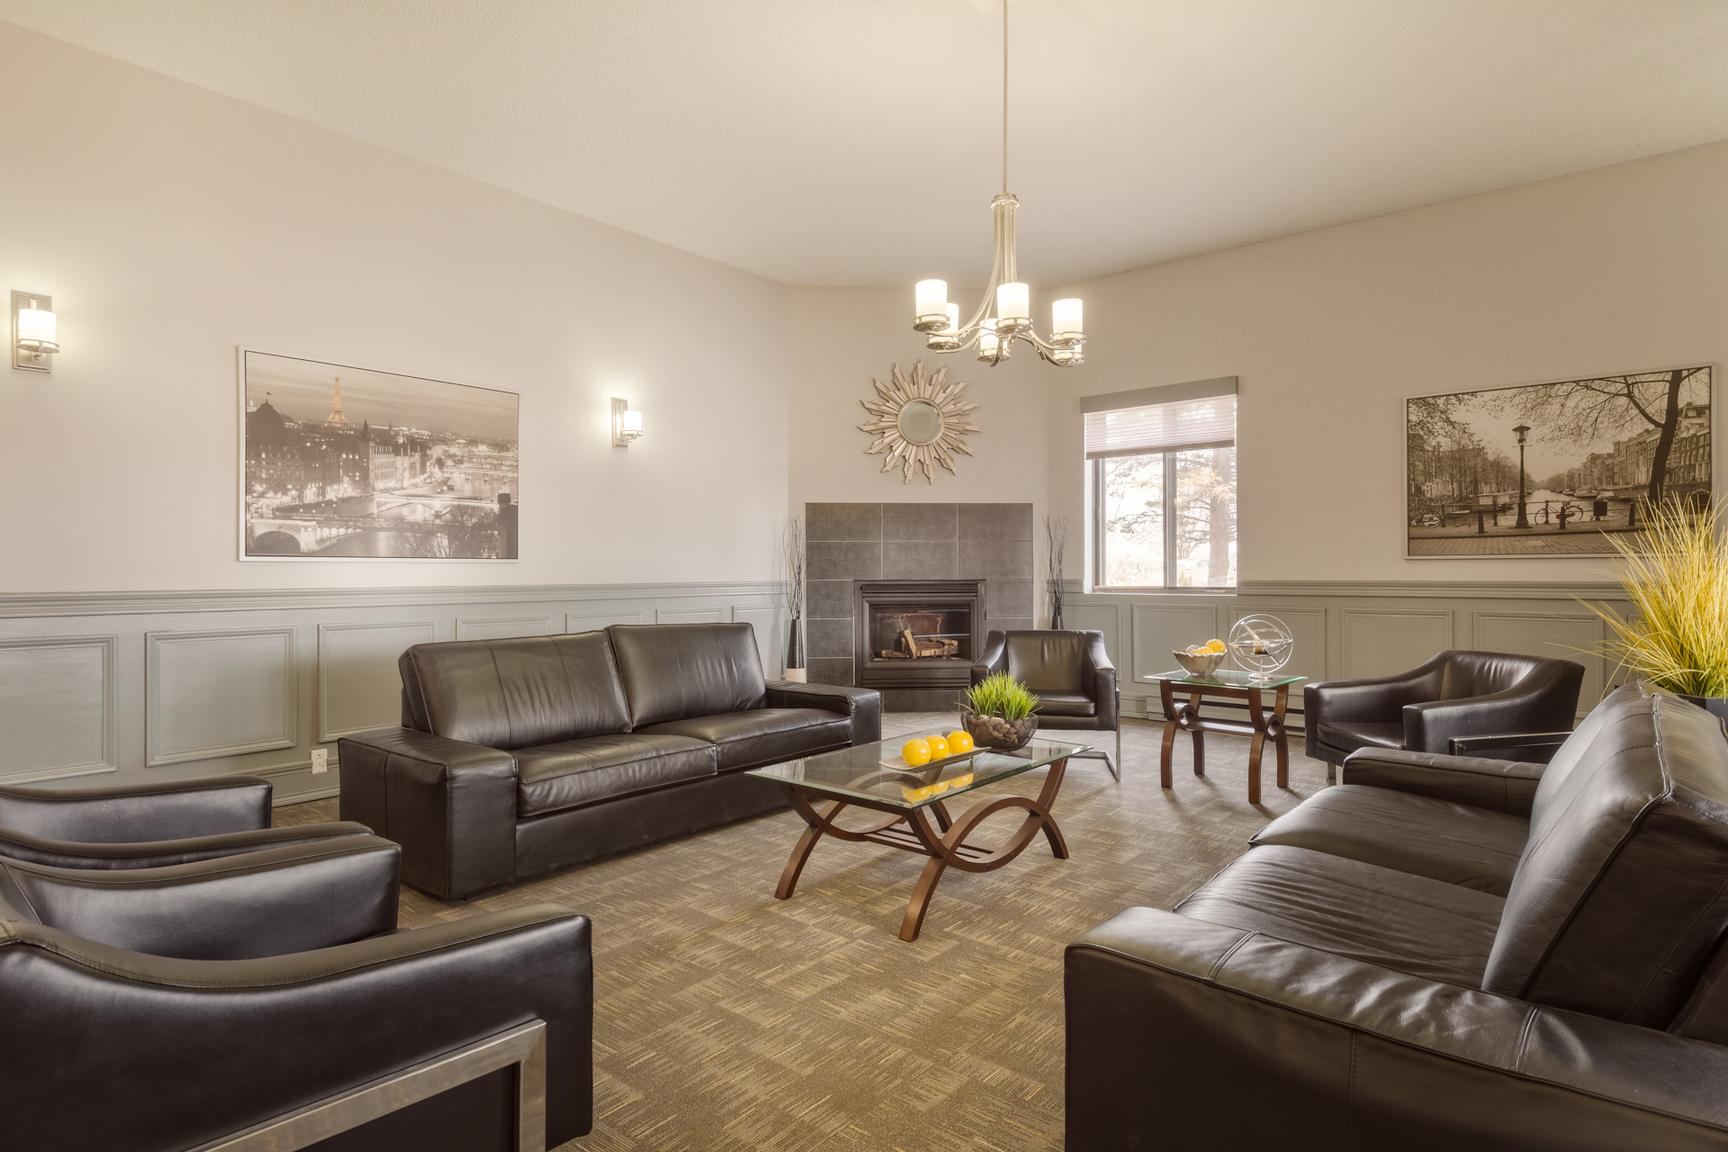 1 bedroom Apartments for rent in Laval at Le Quatre Cent - Photo 24 - RentQuebecApartments – L407184